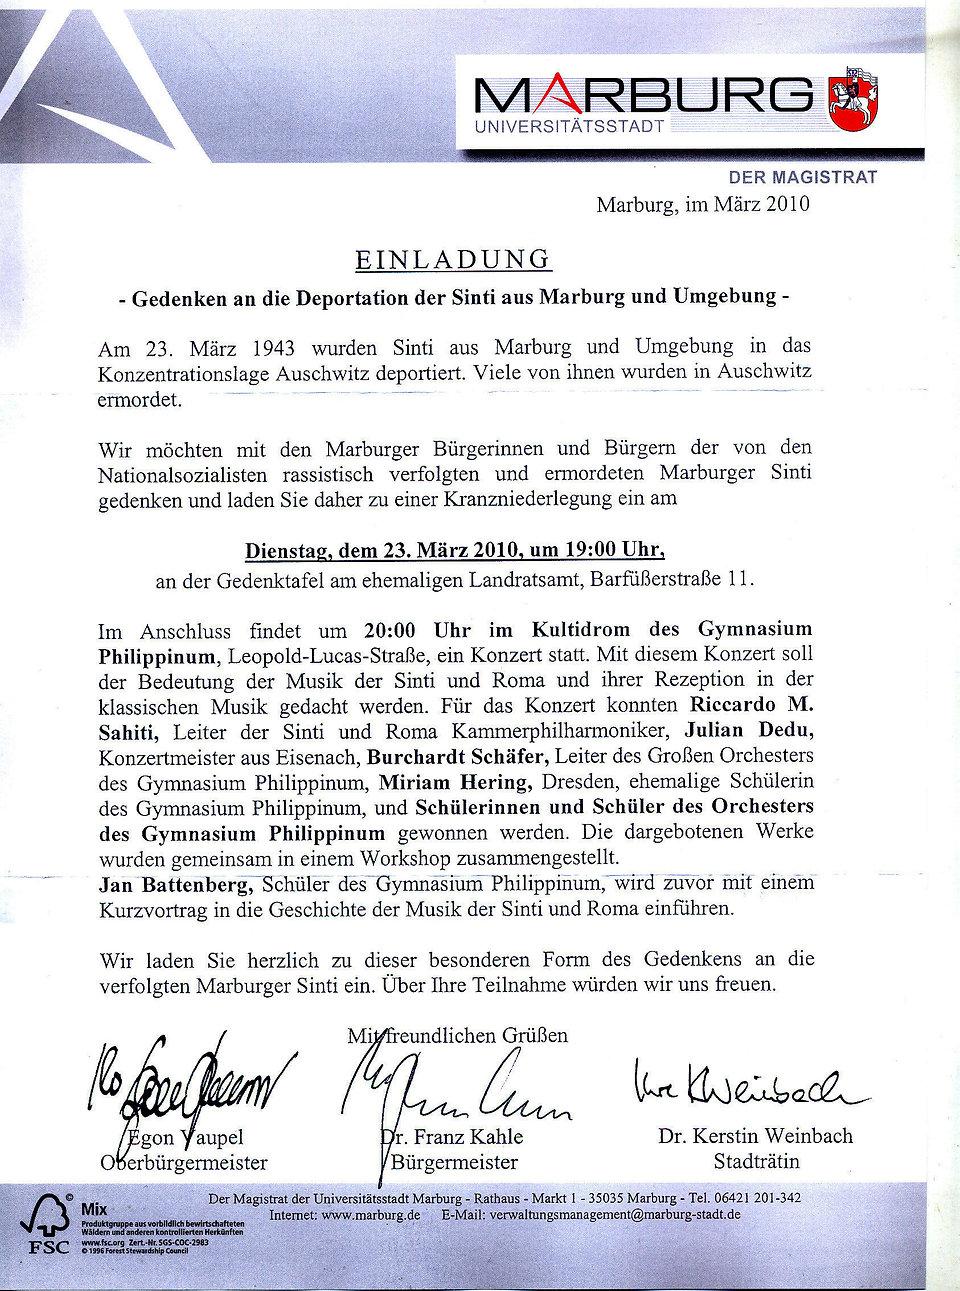 Marburg-Einladung.jpg